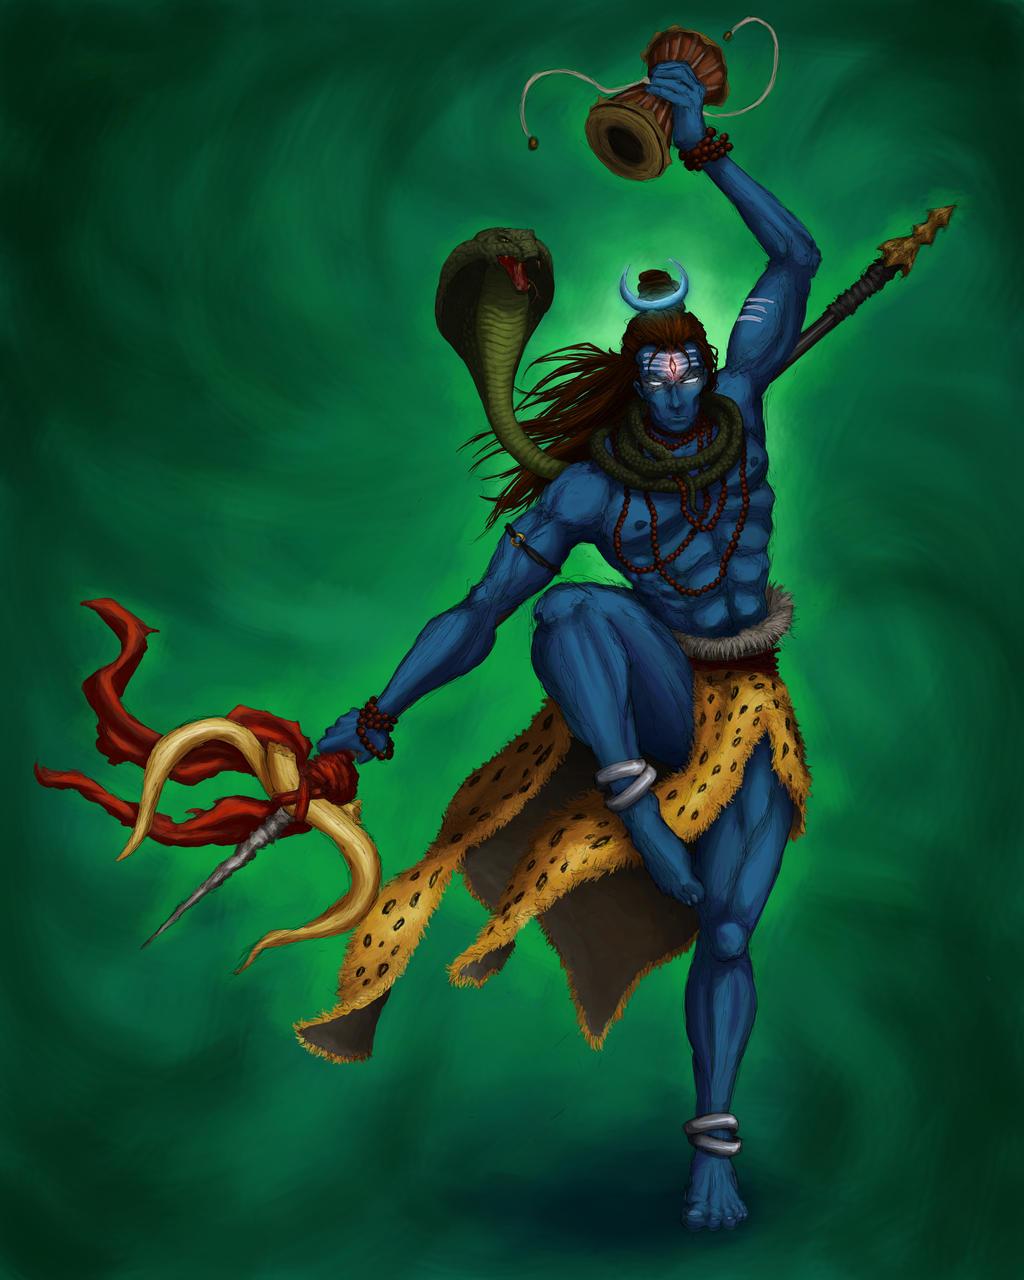 Lord Shiva HD Wallpapers - WallpaperSafari